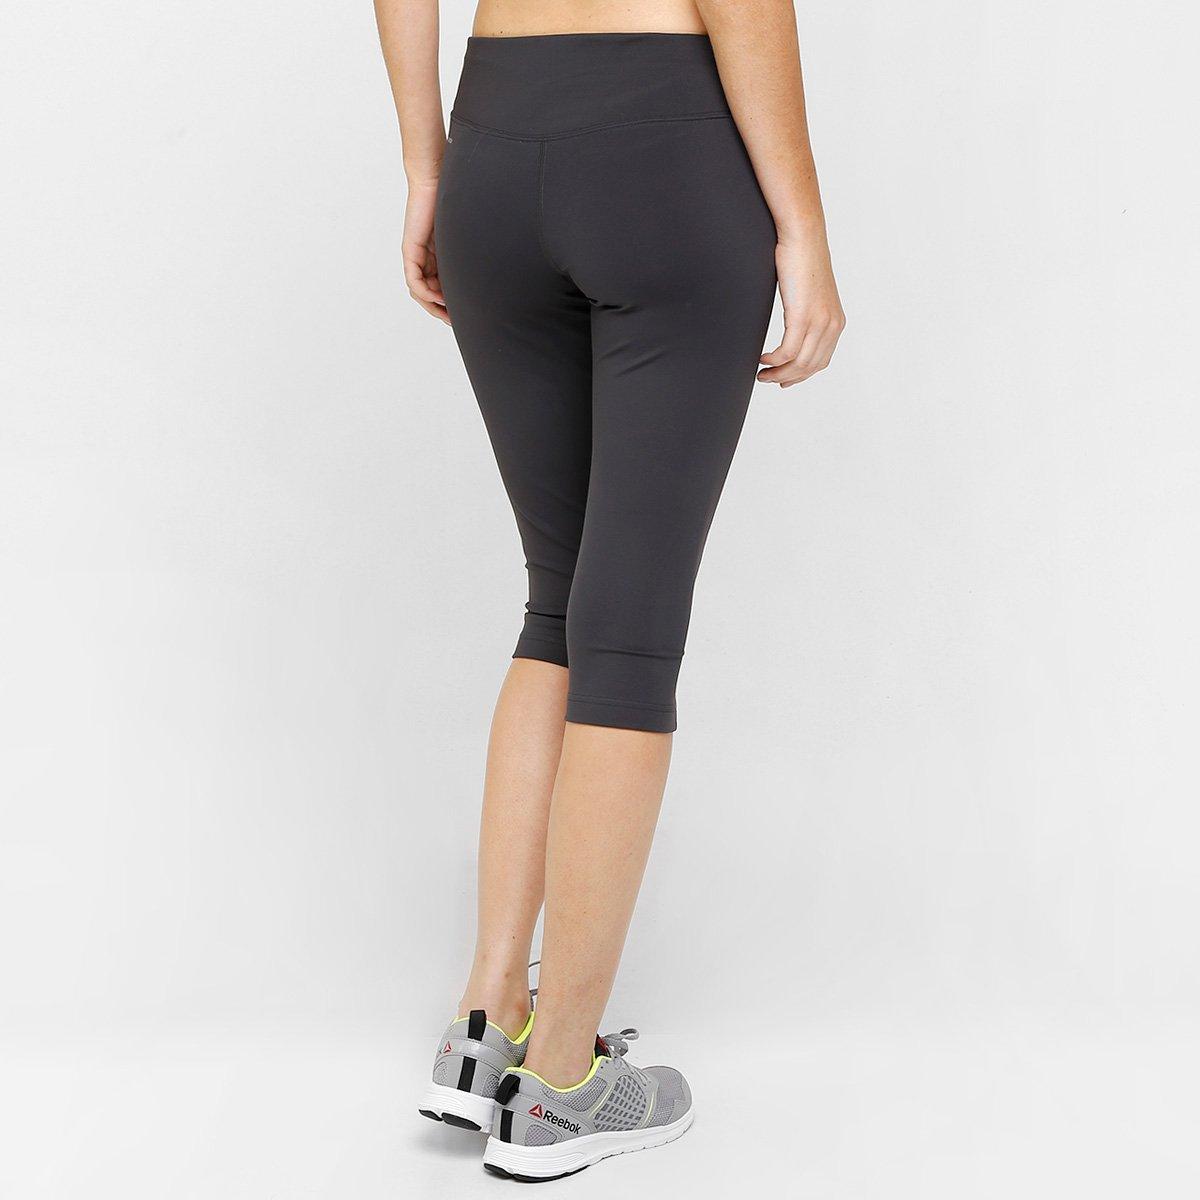 Feminina Race Capri Chumbo Proteção Calça Spartan UV Com Reebok 7Bfwwq